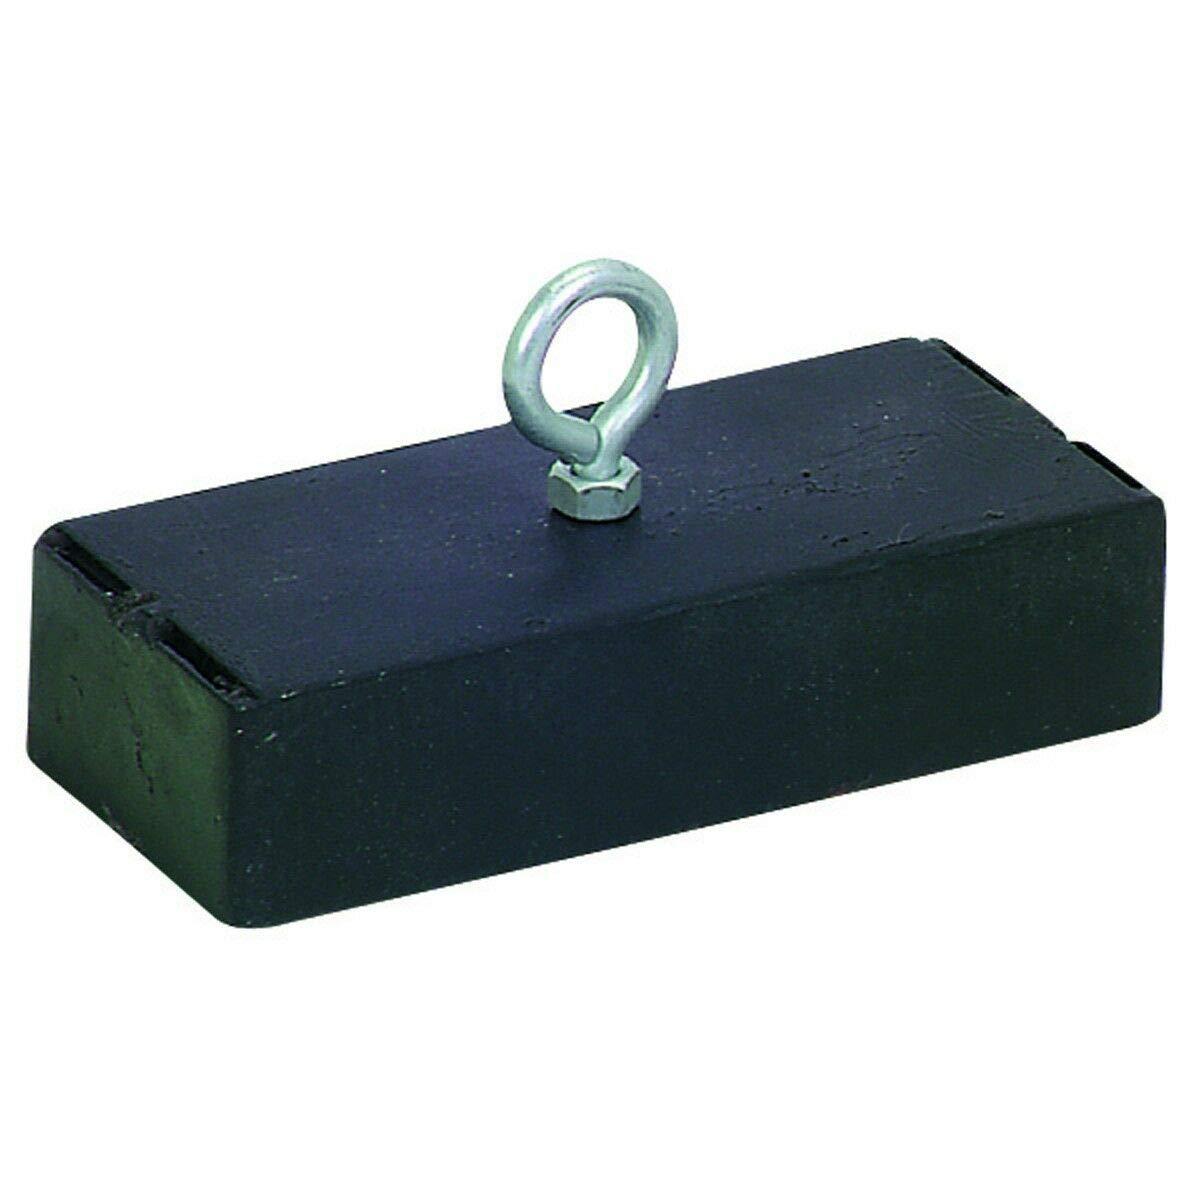 Jak N Joe 250 lb Pull Retrieving Magnet Ferrite Black Lost Fishing Gear Scrap Metal Nail Retriever Size 6.4'' x 1.5'' x 3.3'' (LxWxH) Modern Style Set of 1